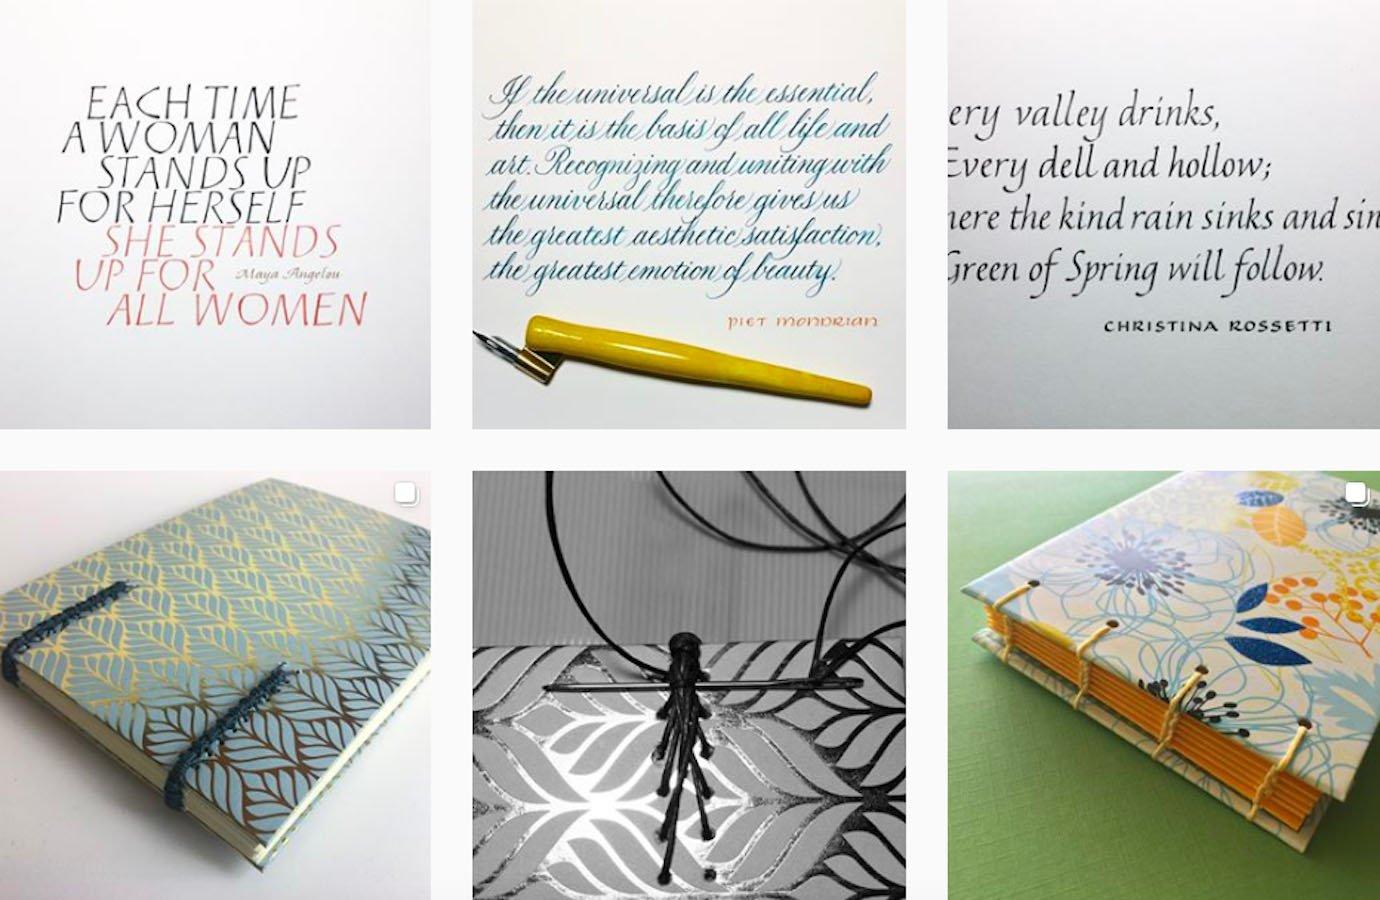 Web Design Inspiration: 110+ Accounts On Instagram and 10+ Best UX & Web Design Books in 2020 - lindayoshida